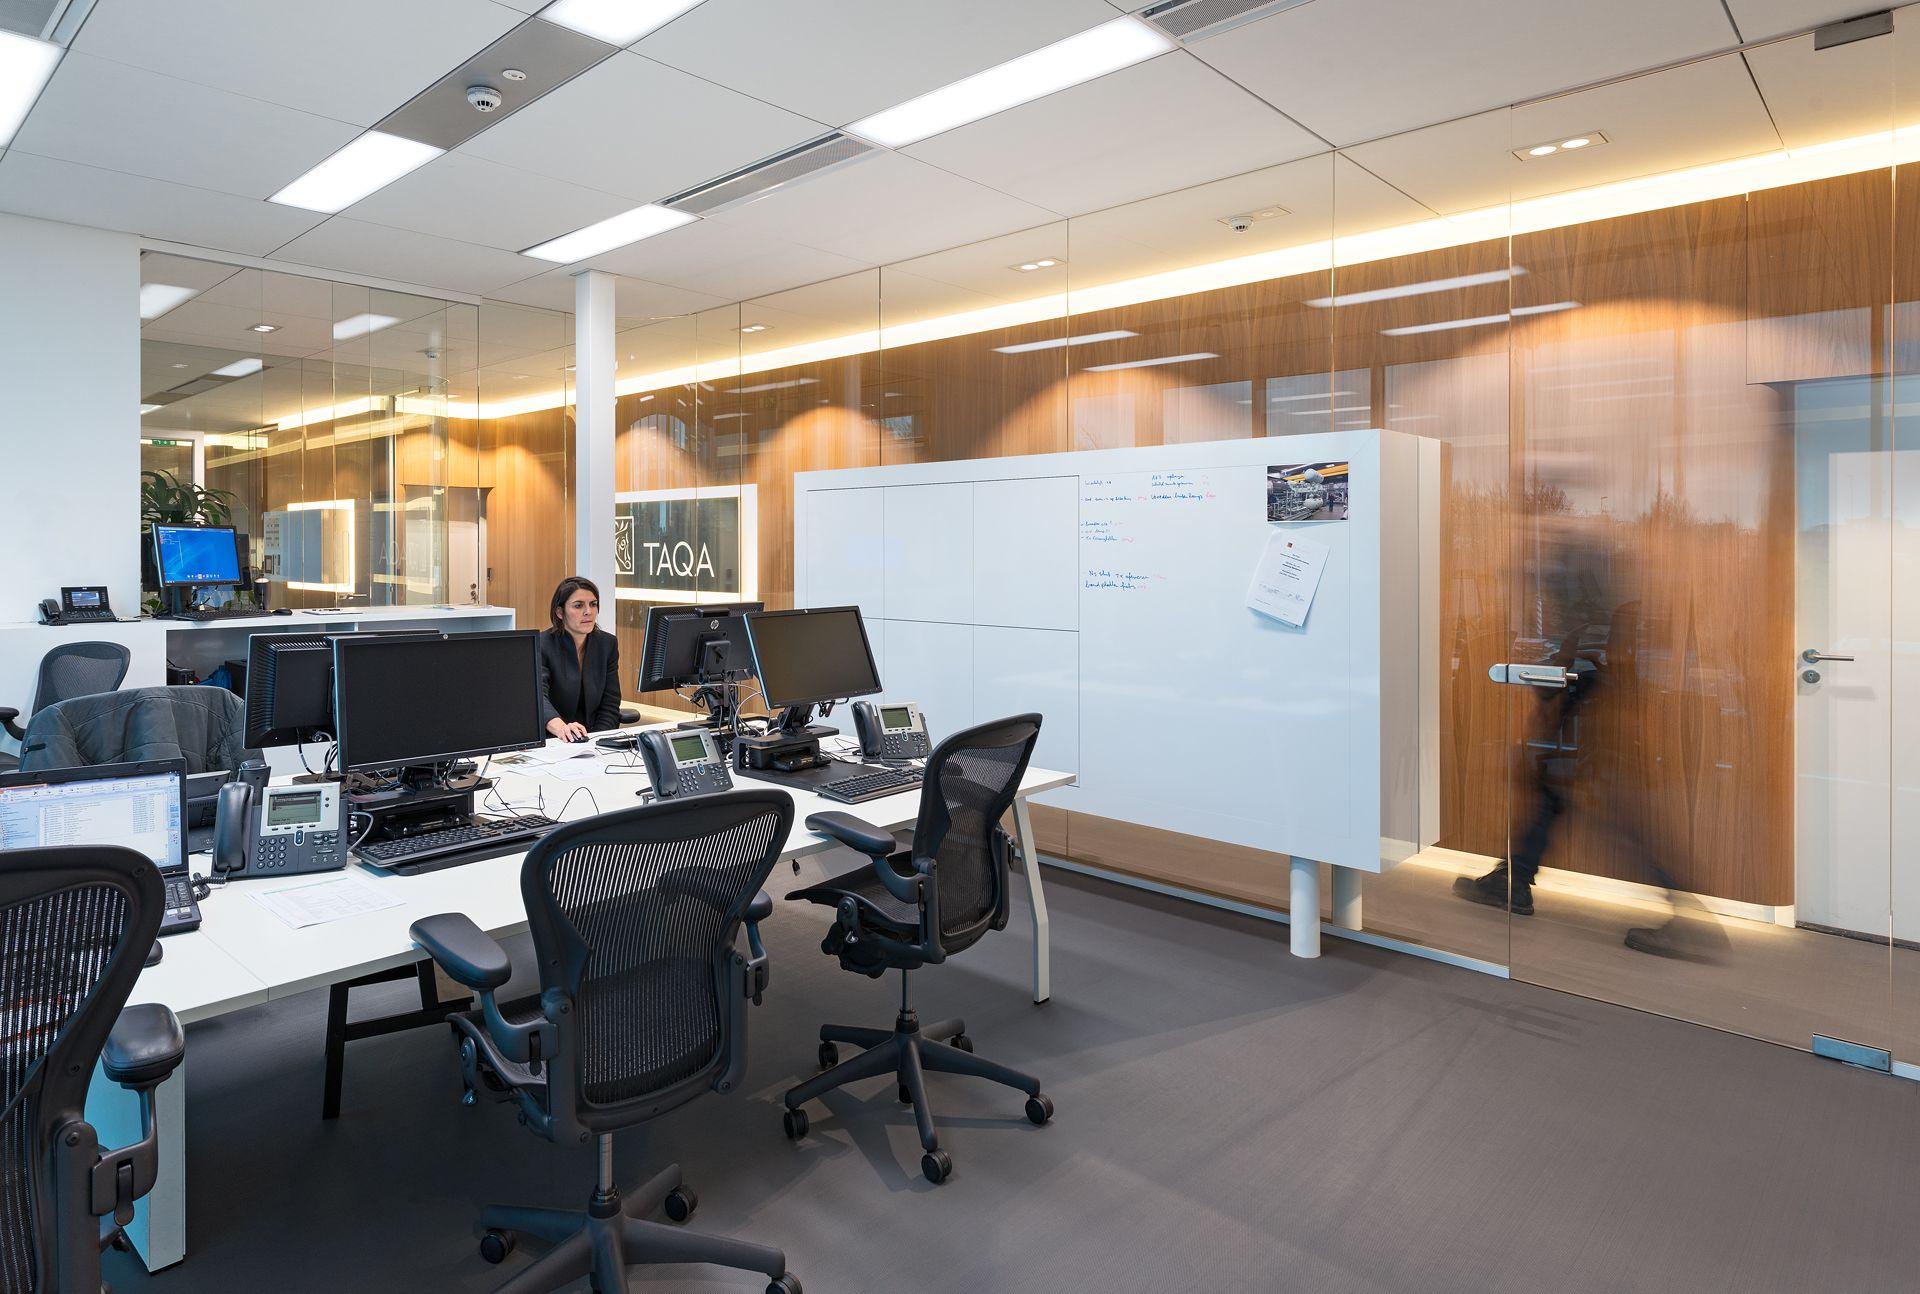 taqa corporate office interior. Taqa Corporate Office Interior I